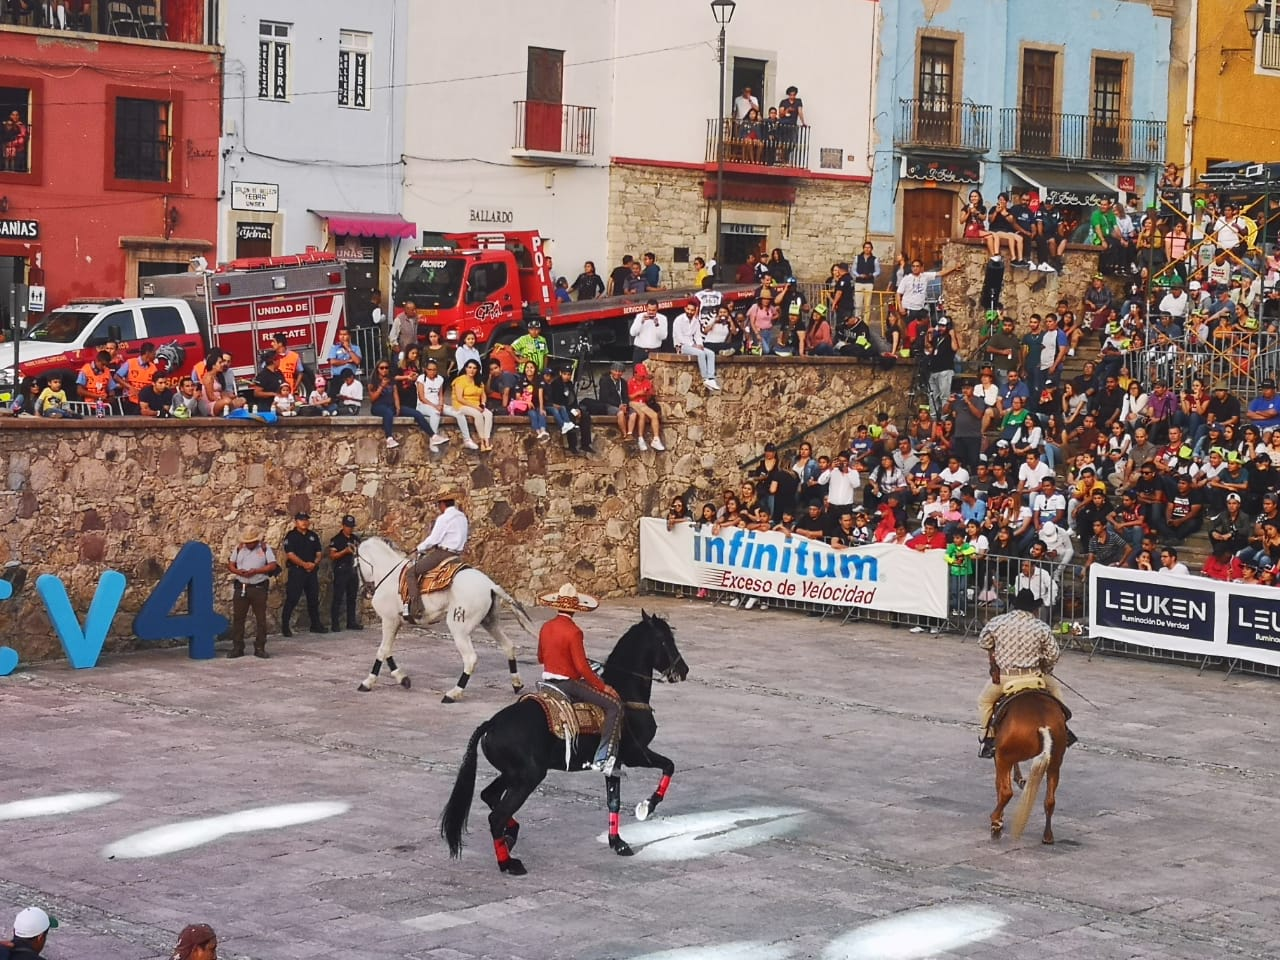 WRC: 17º Rallye Guanajuato Corona - México [12-15 Marzo] - Página 2 ES9AGkLXkAYkYd-?format=jpg&name=large